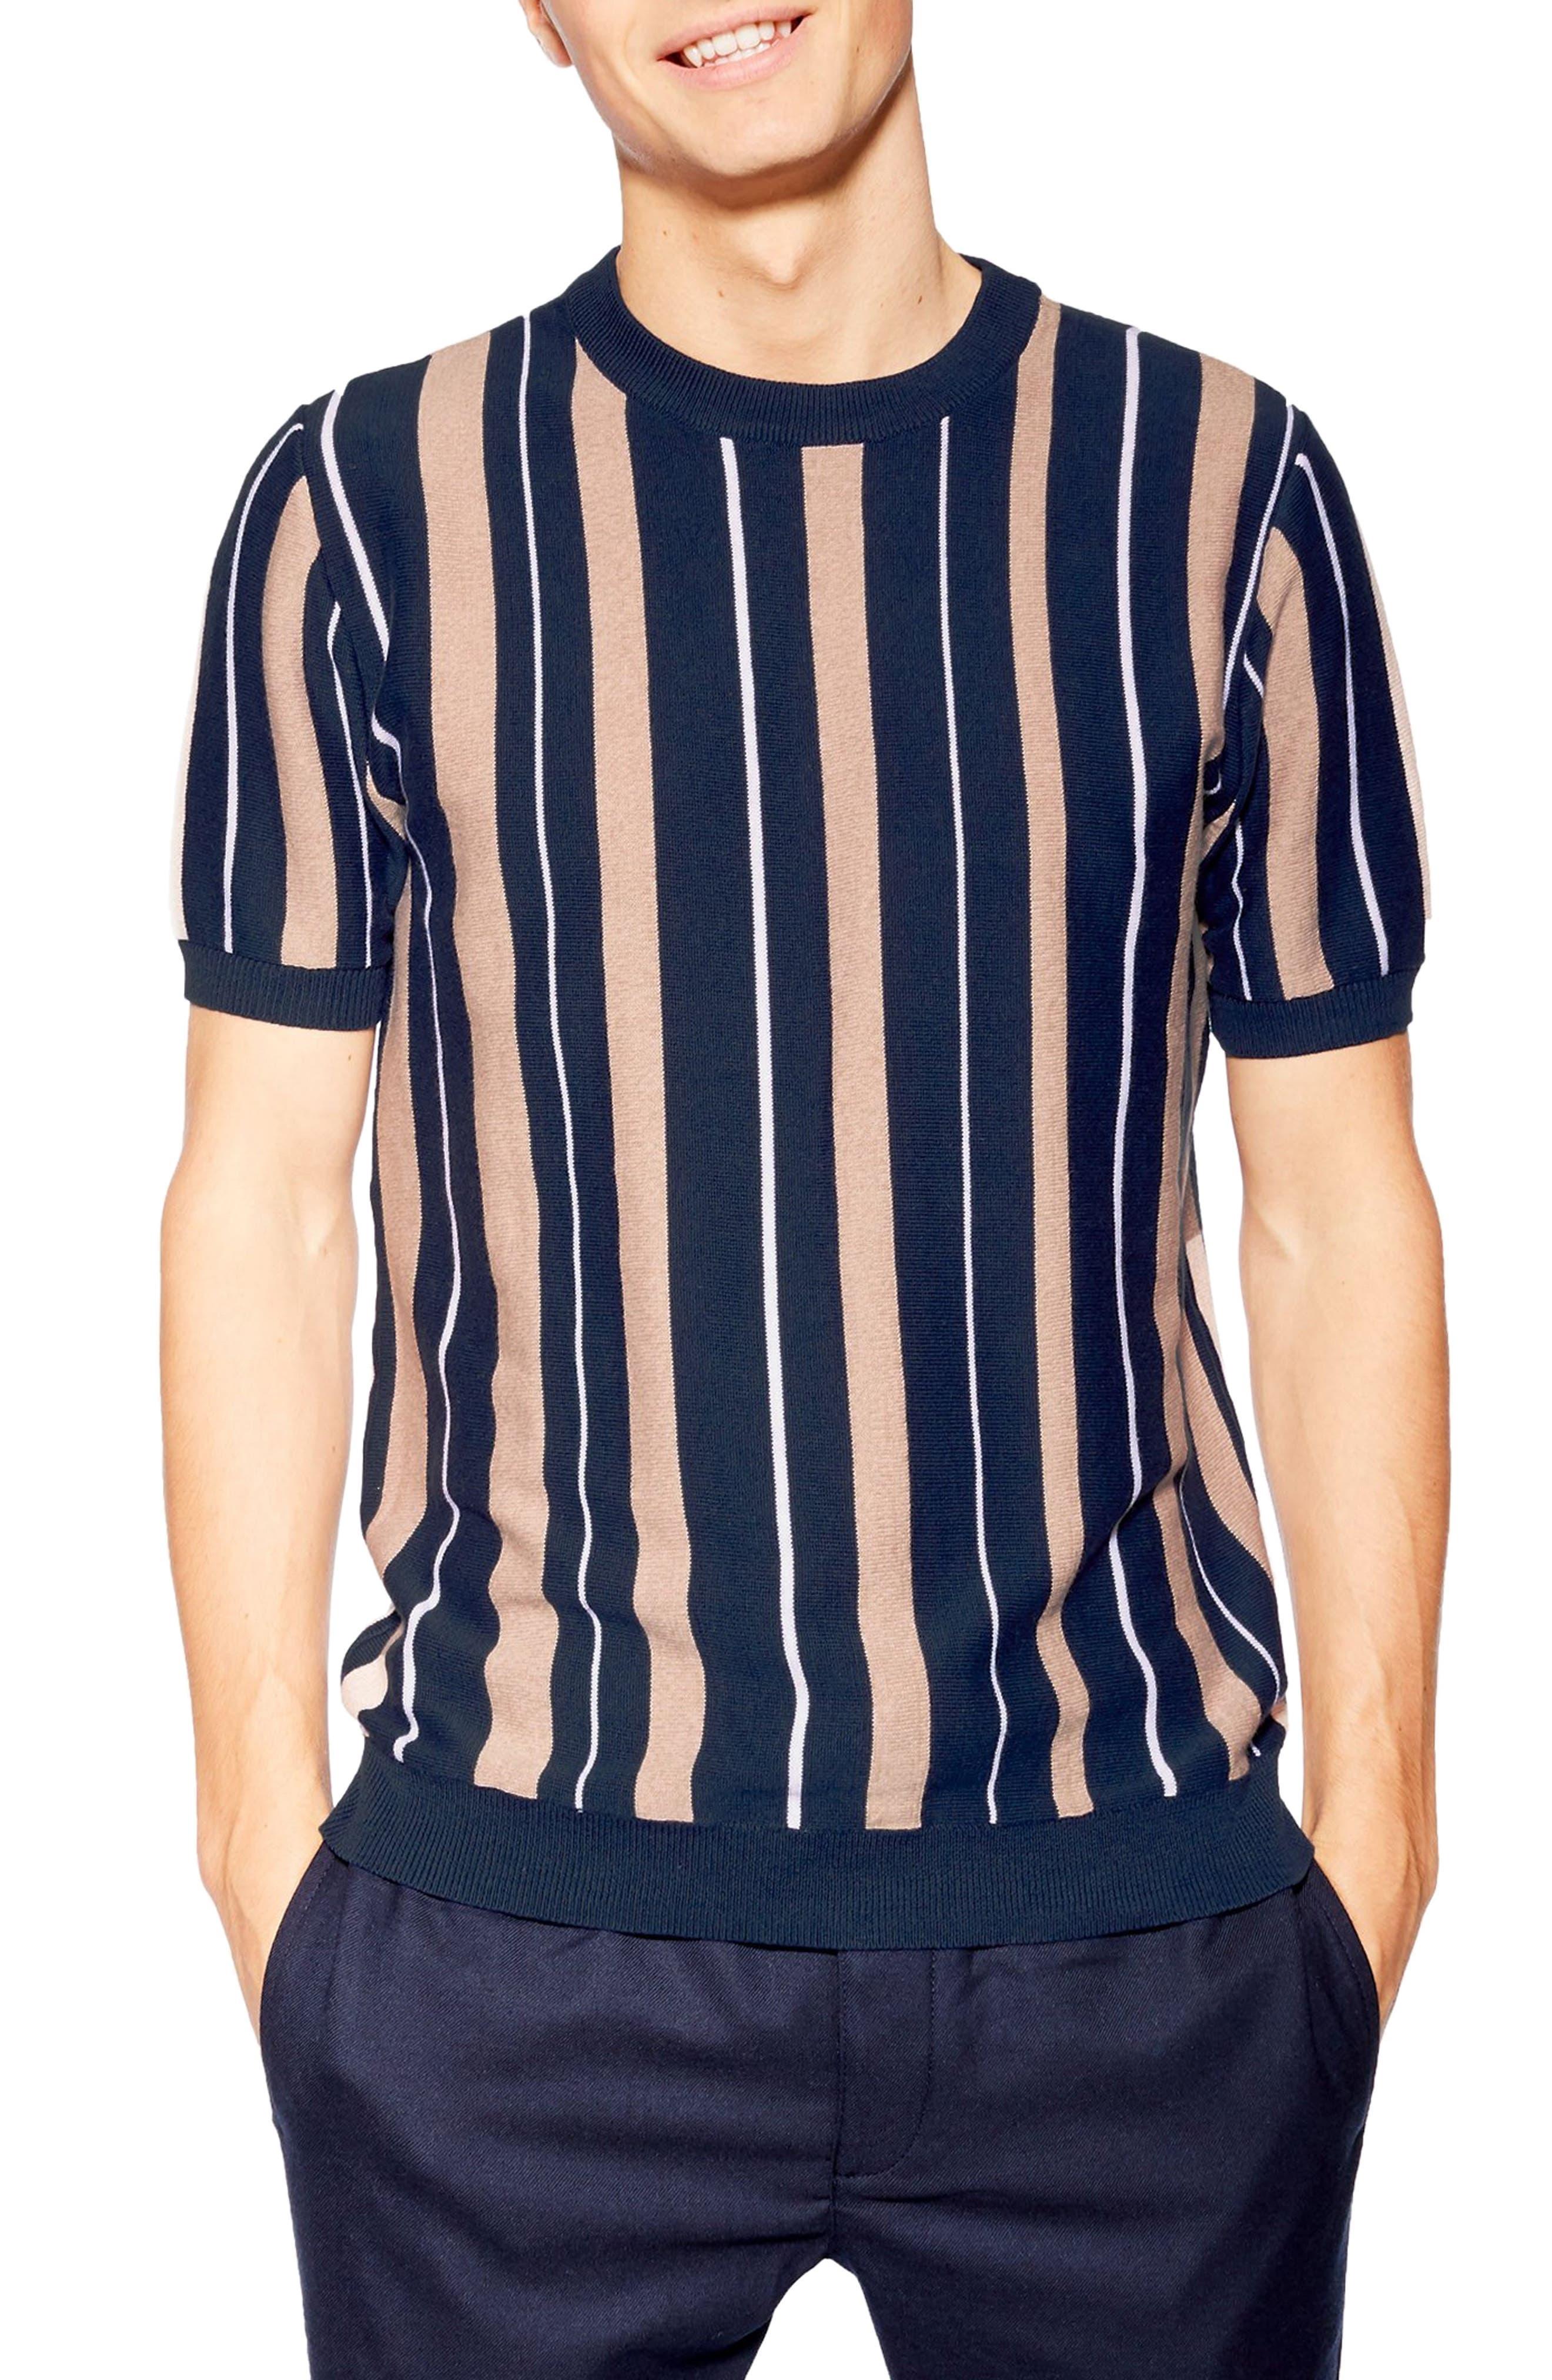 1960s – 70s Mens Shirts- Disco Shirts, Hippie Shirts Mens Topman Vertical Stripe Knit T-Shirt $45.00 AT vintagedancer.com